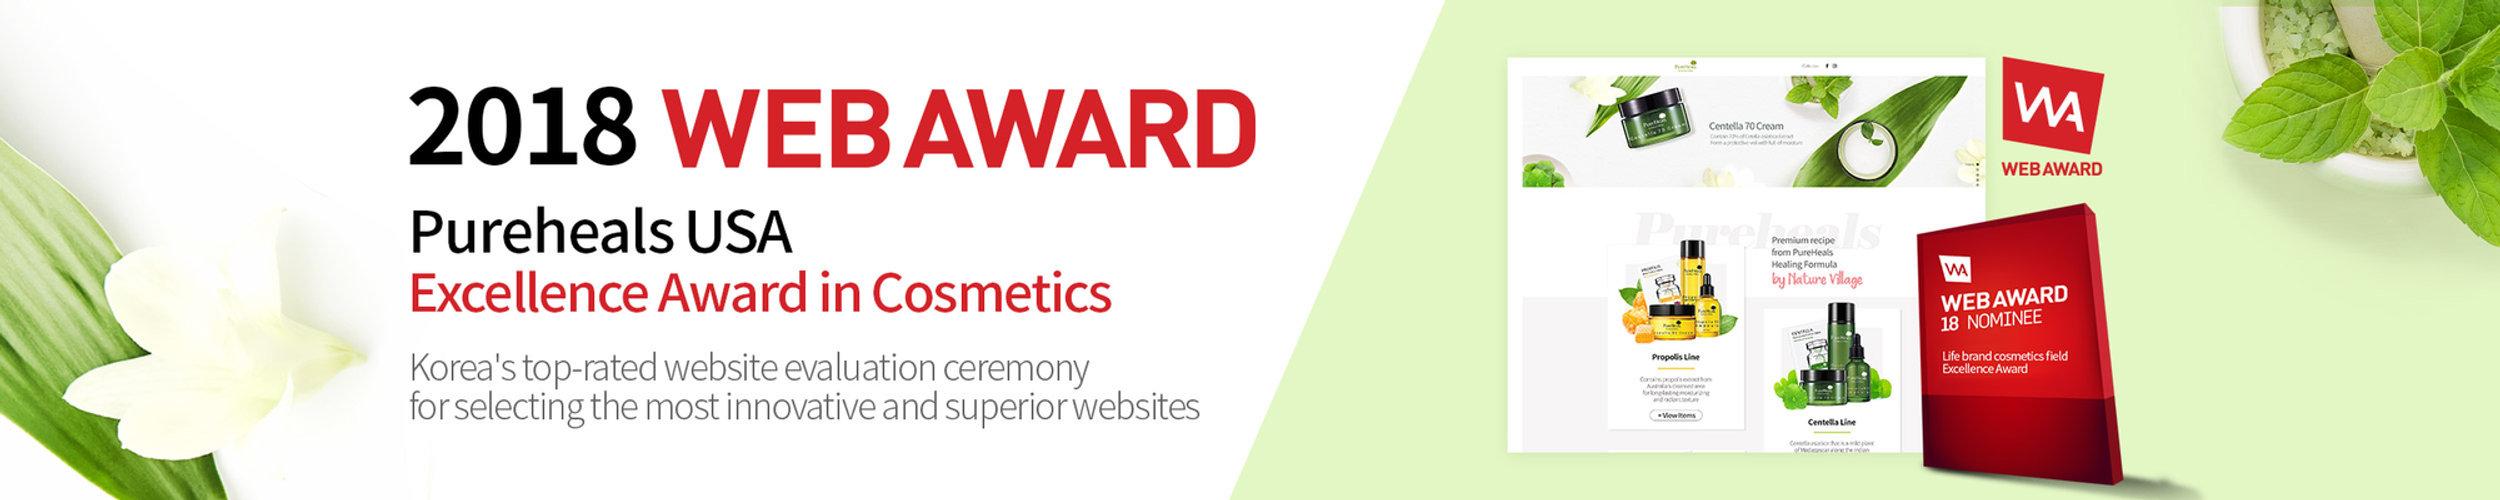 web_award.jpg